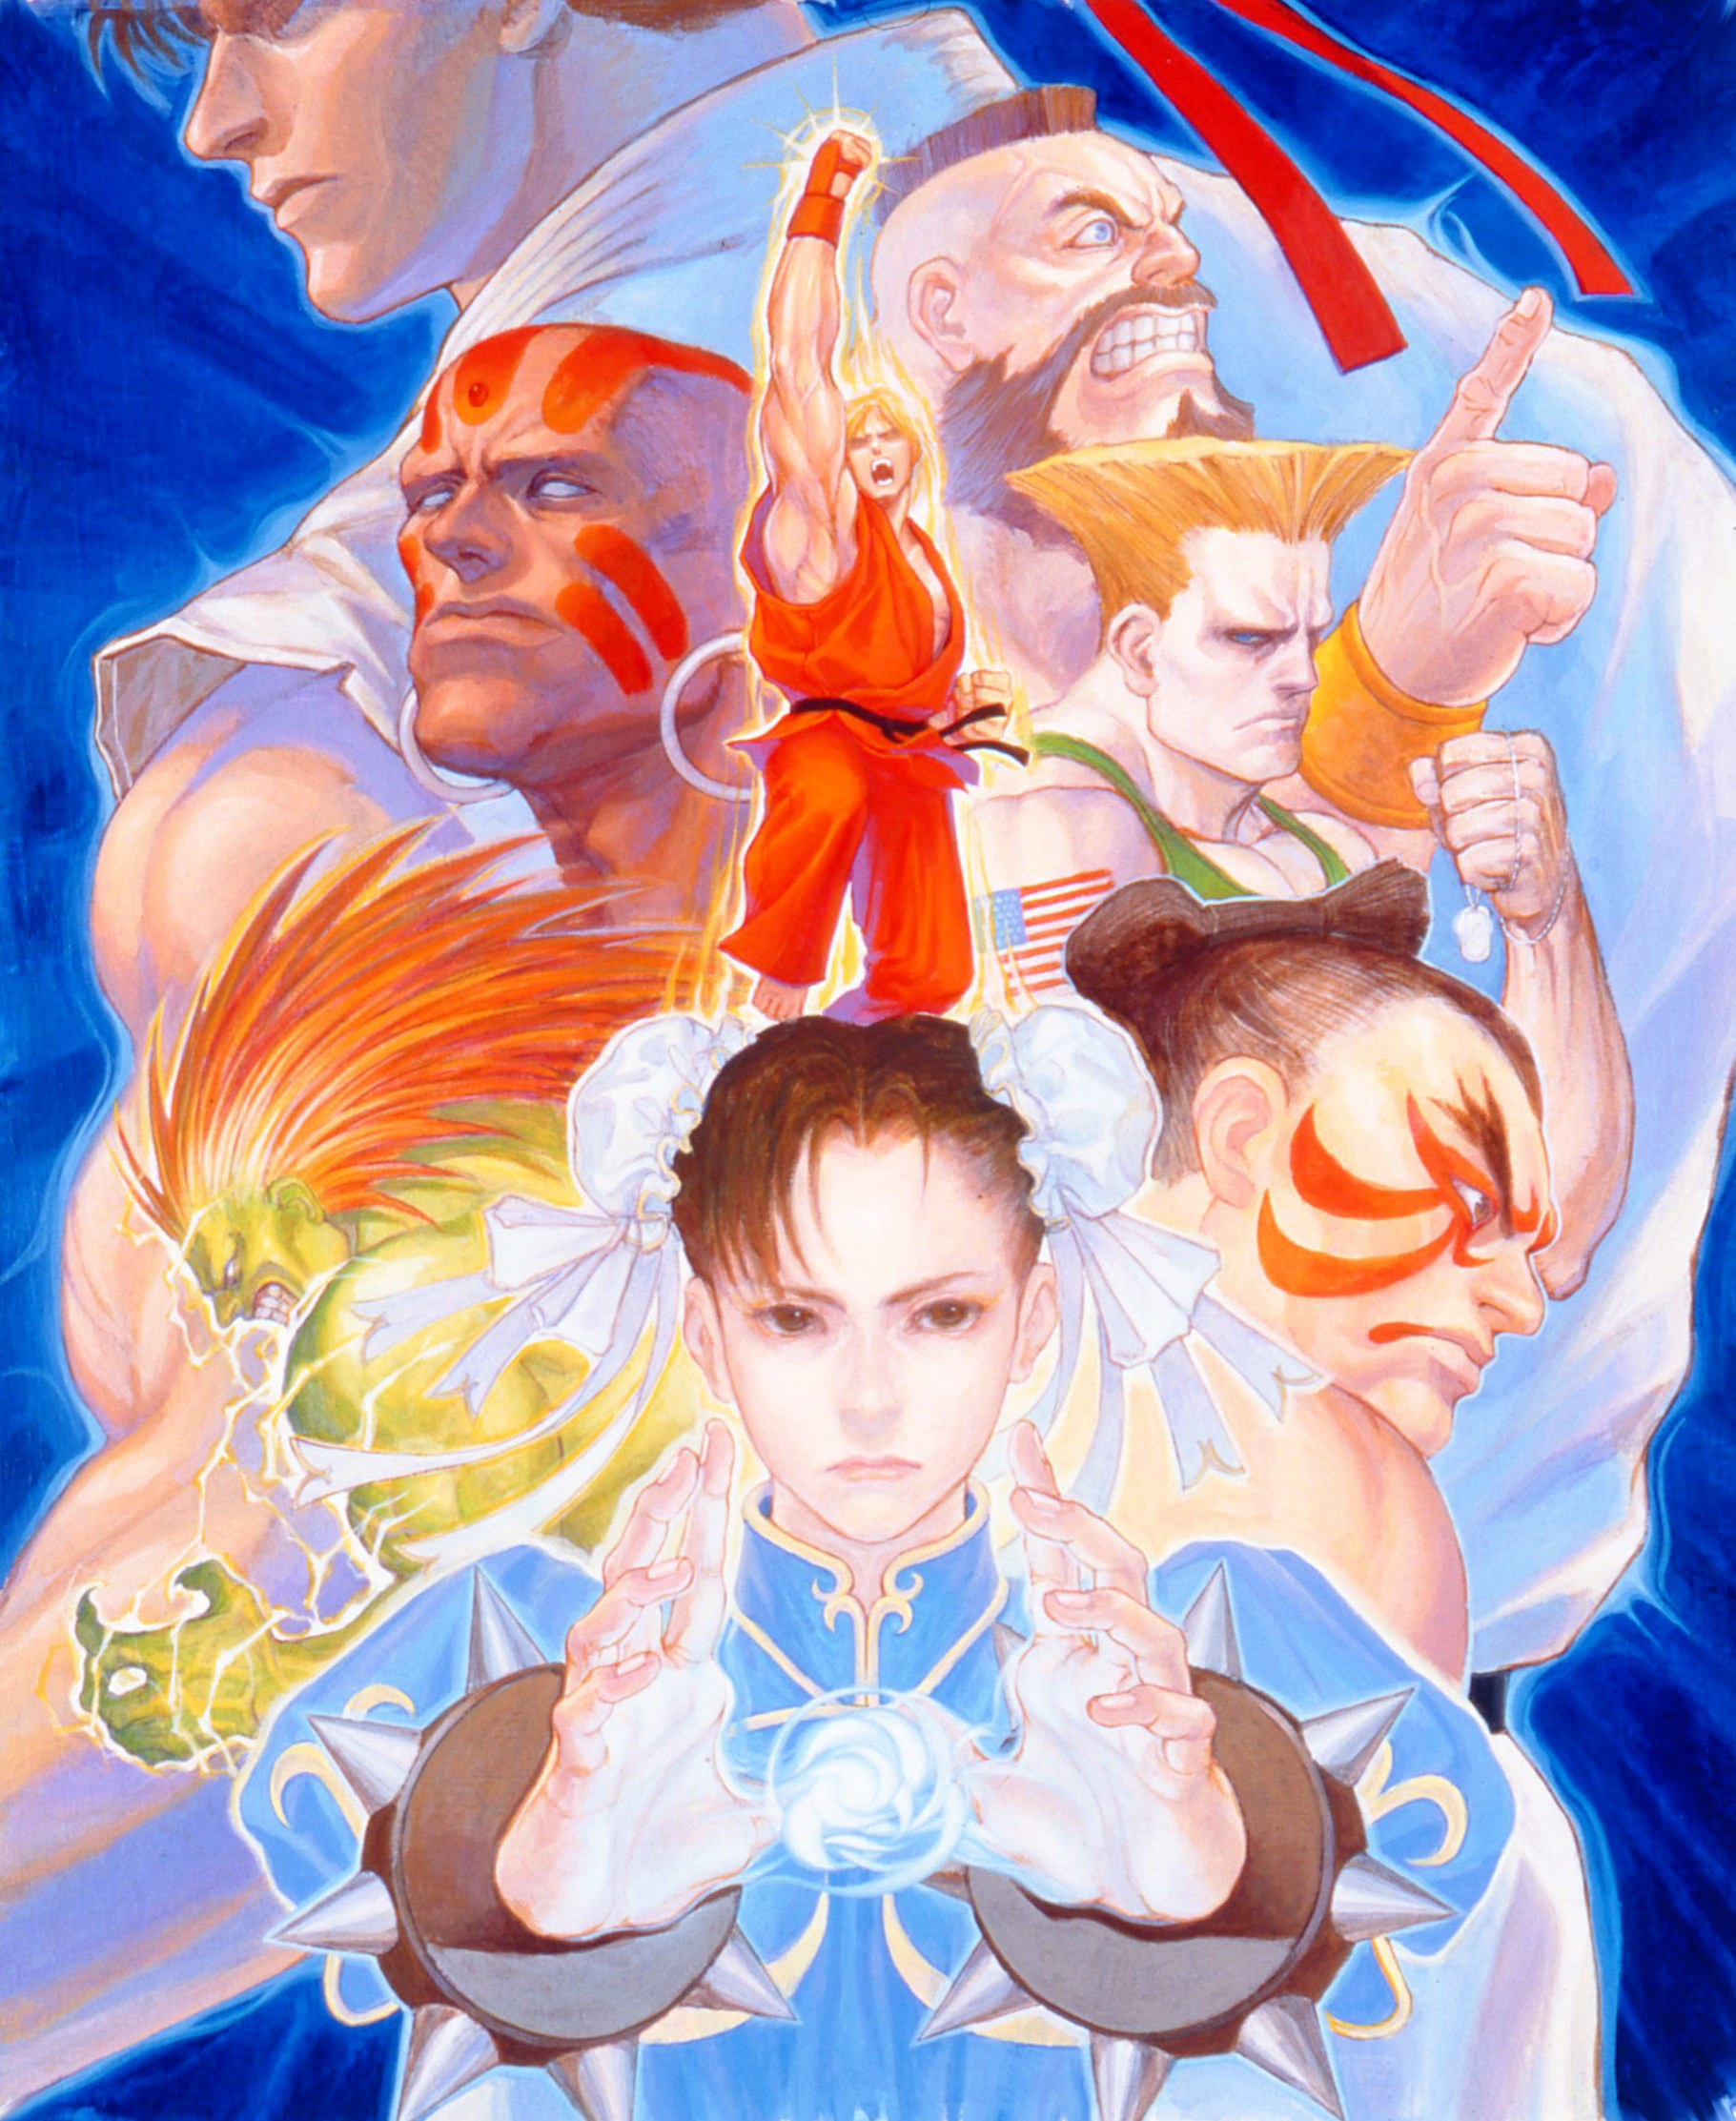 Street_Fighter_II_Turbo_Art_02